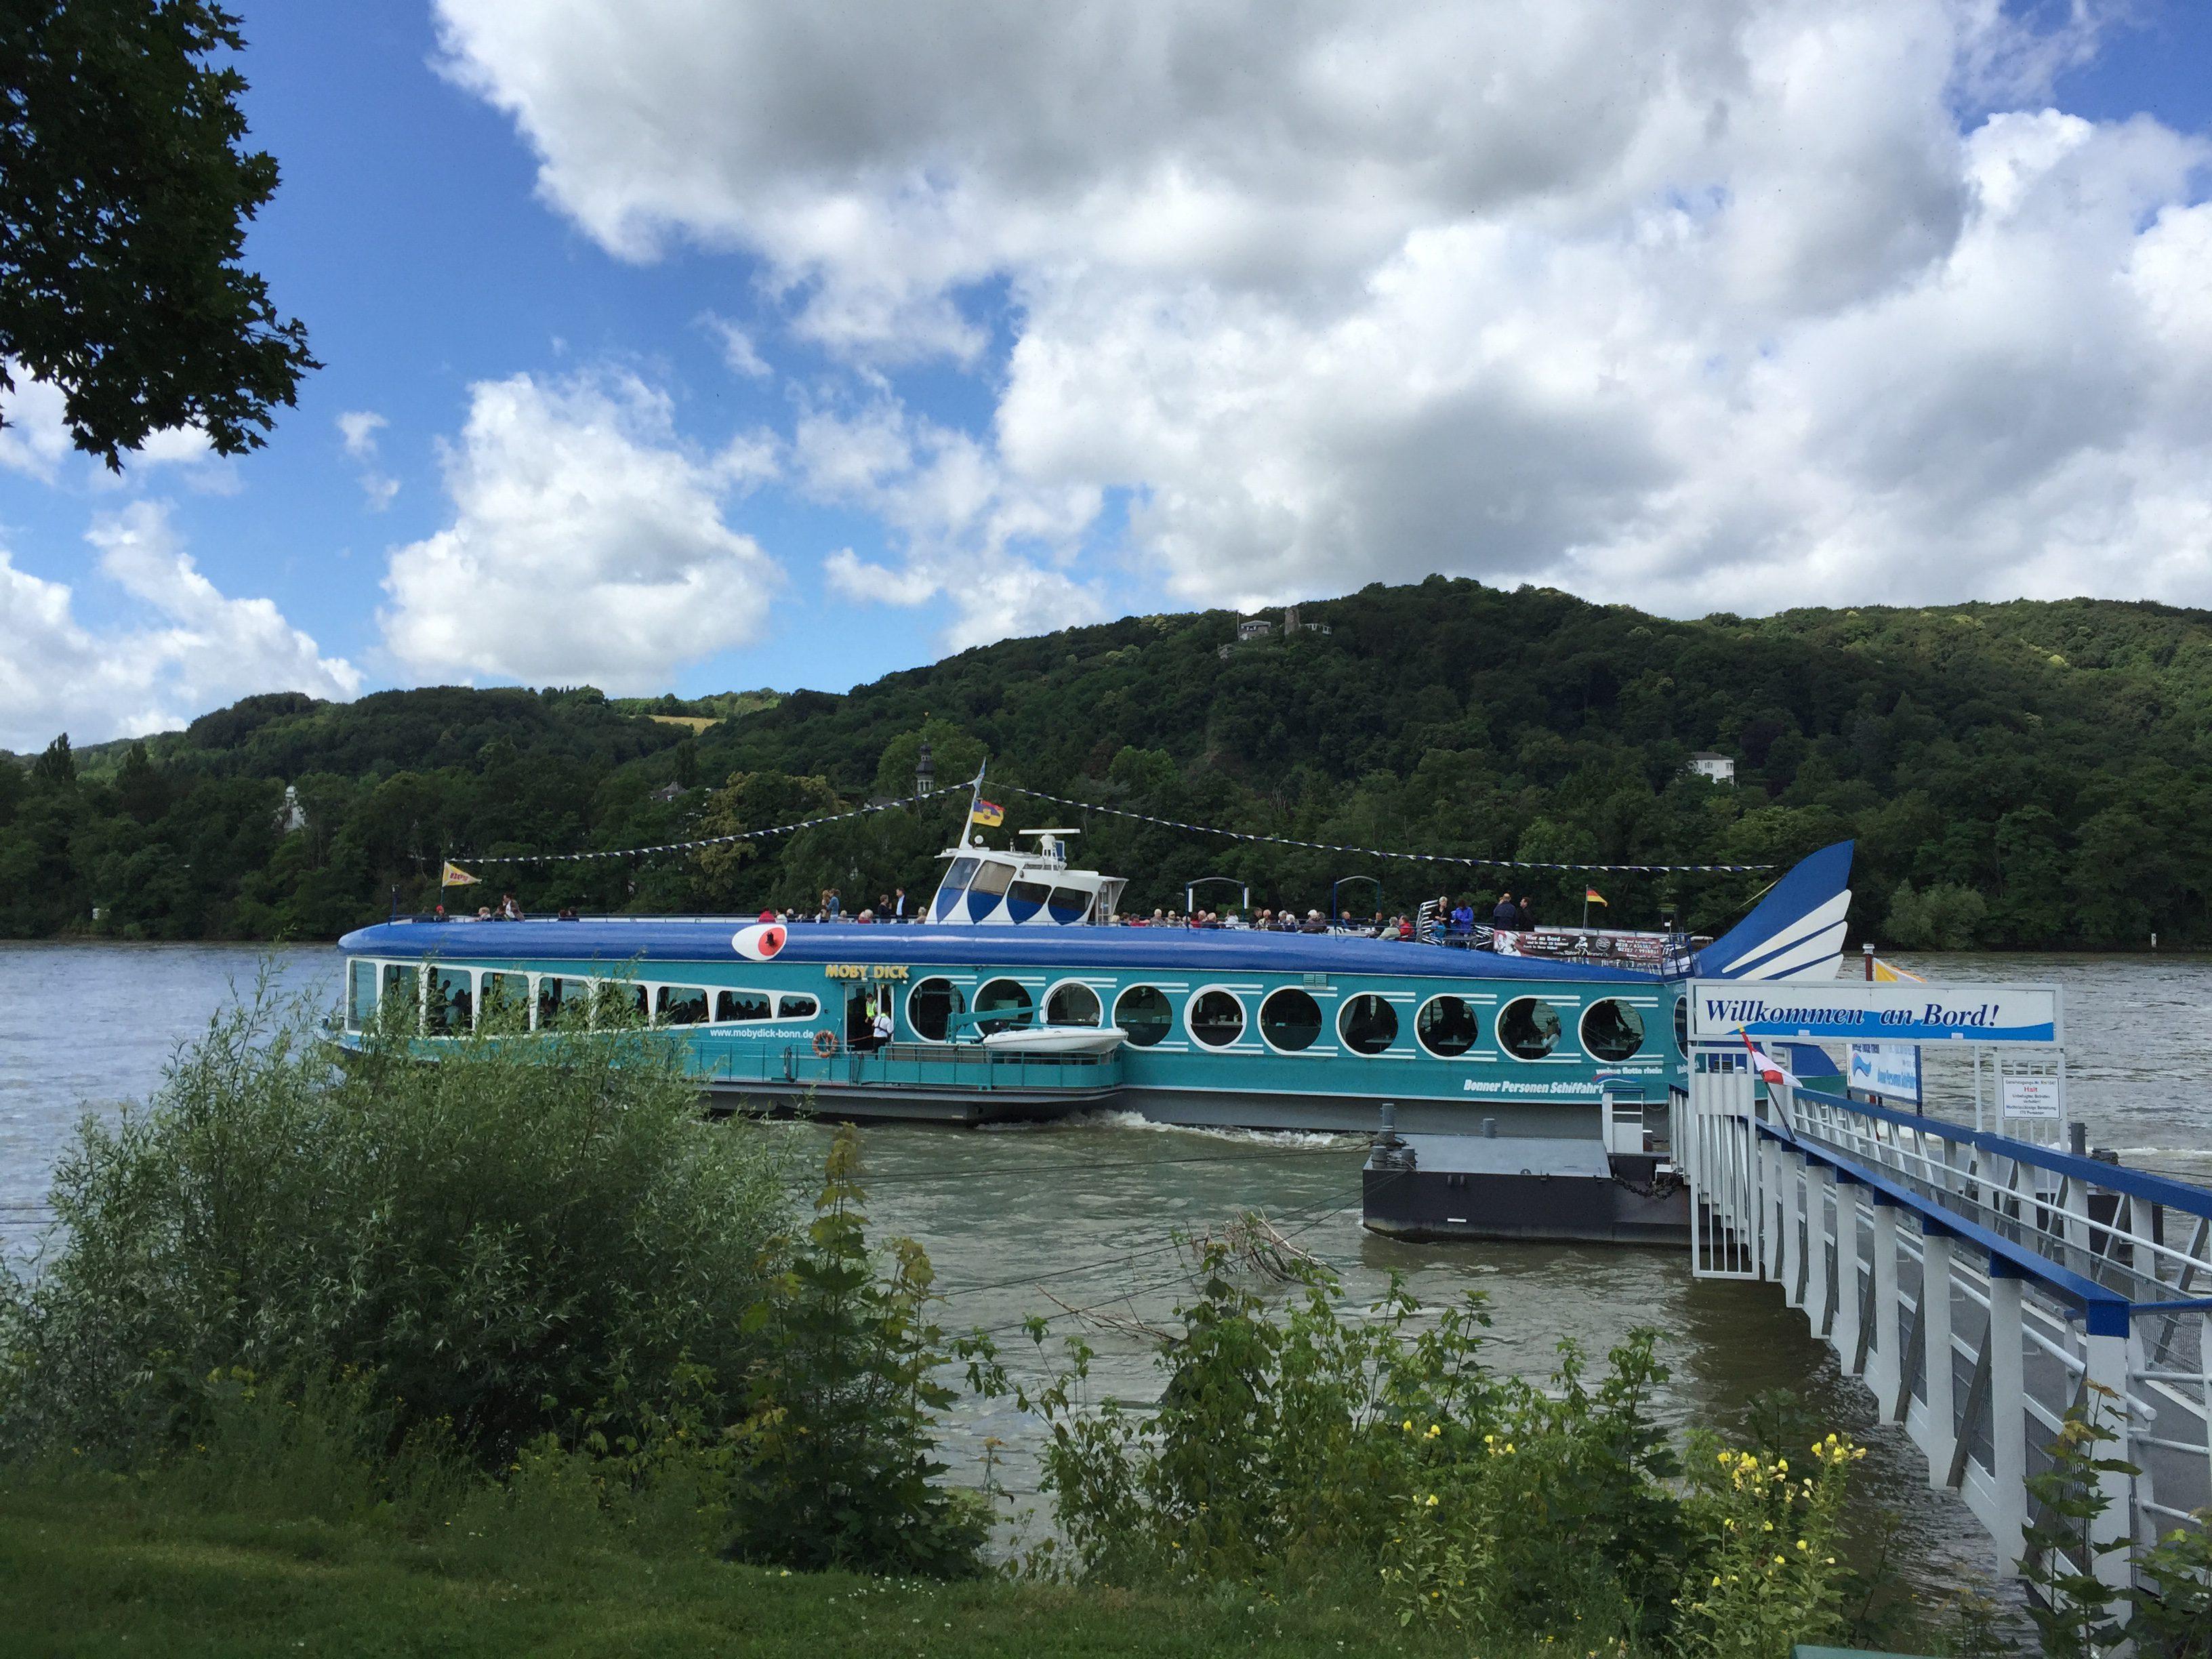 Moby Dick Personenschifffahrt Bonn Ausflug Reiseblog